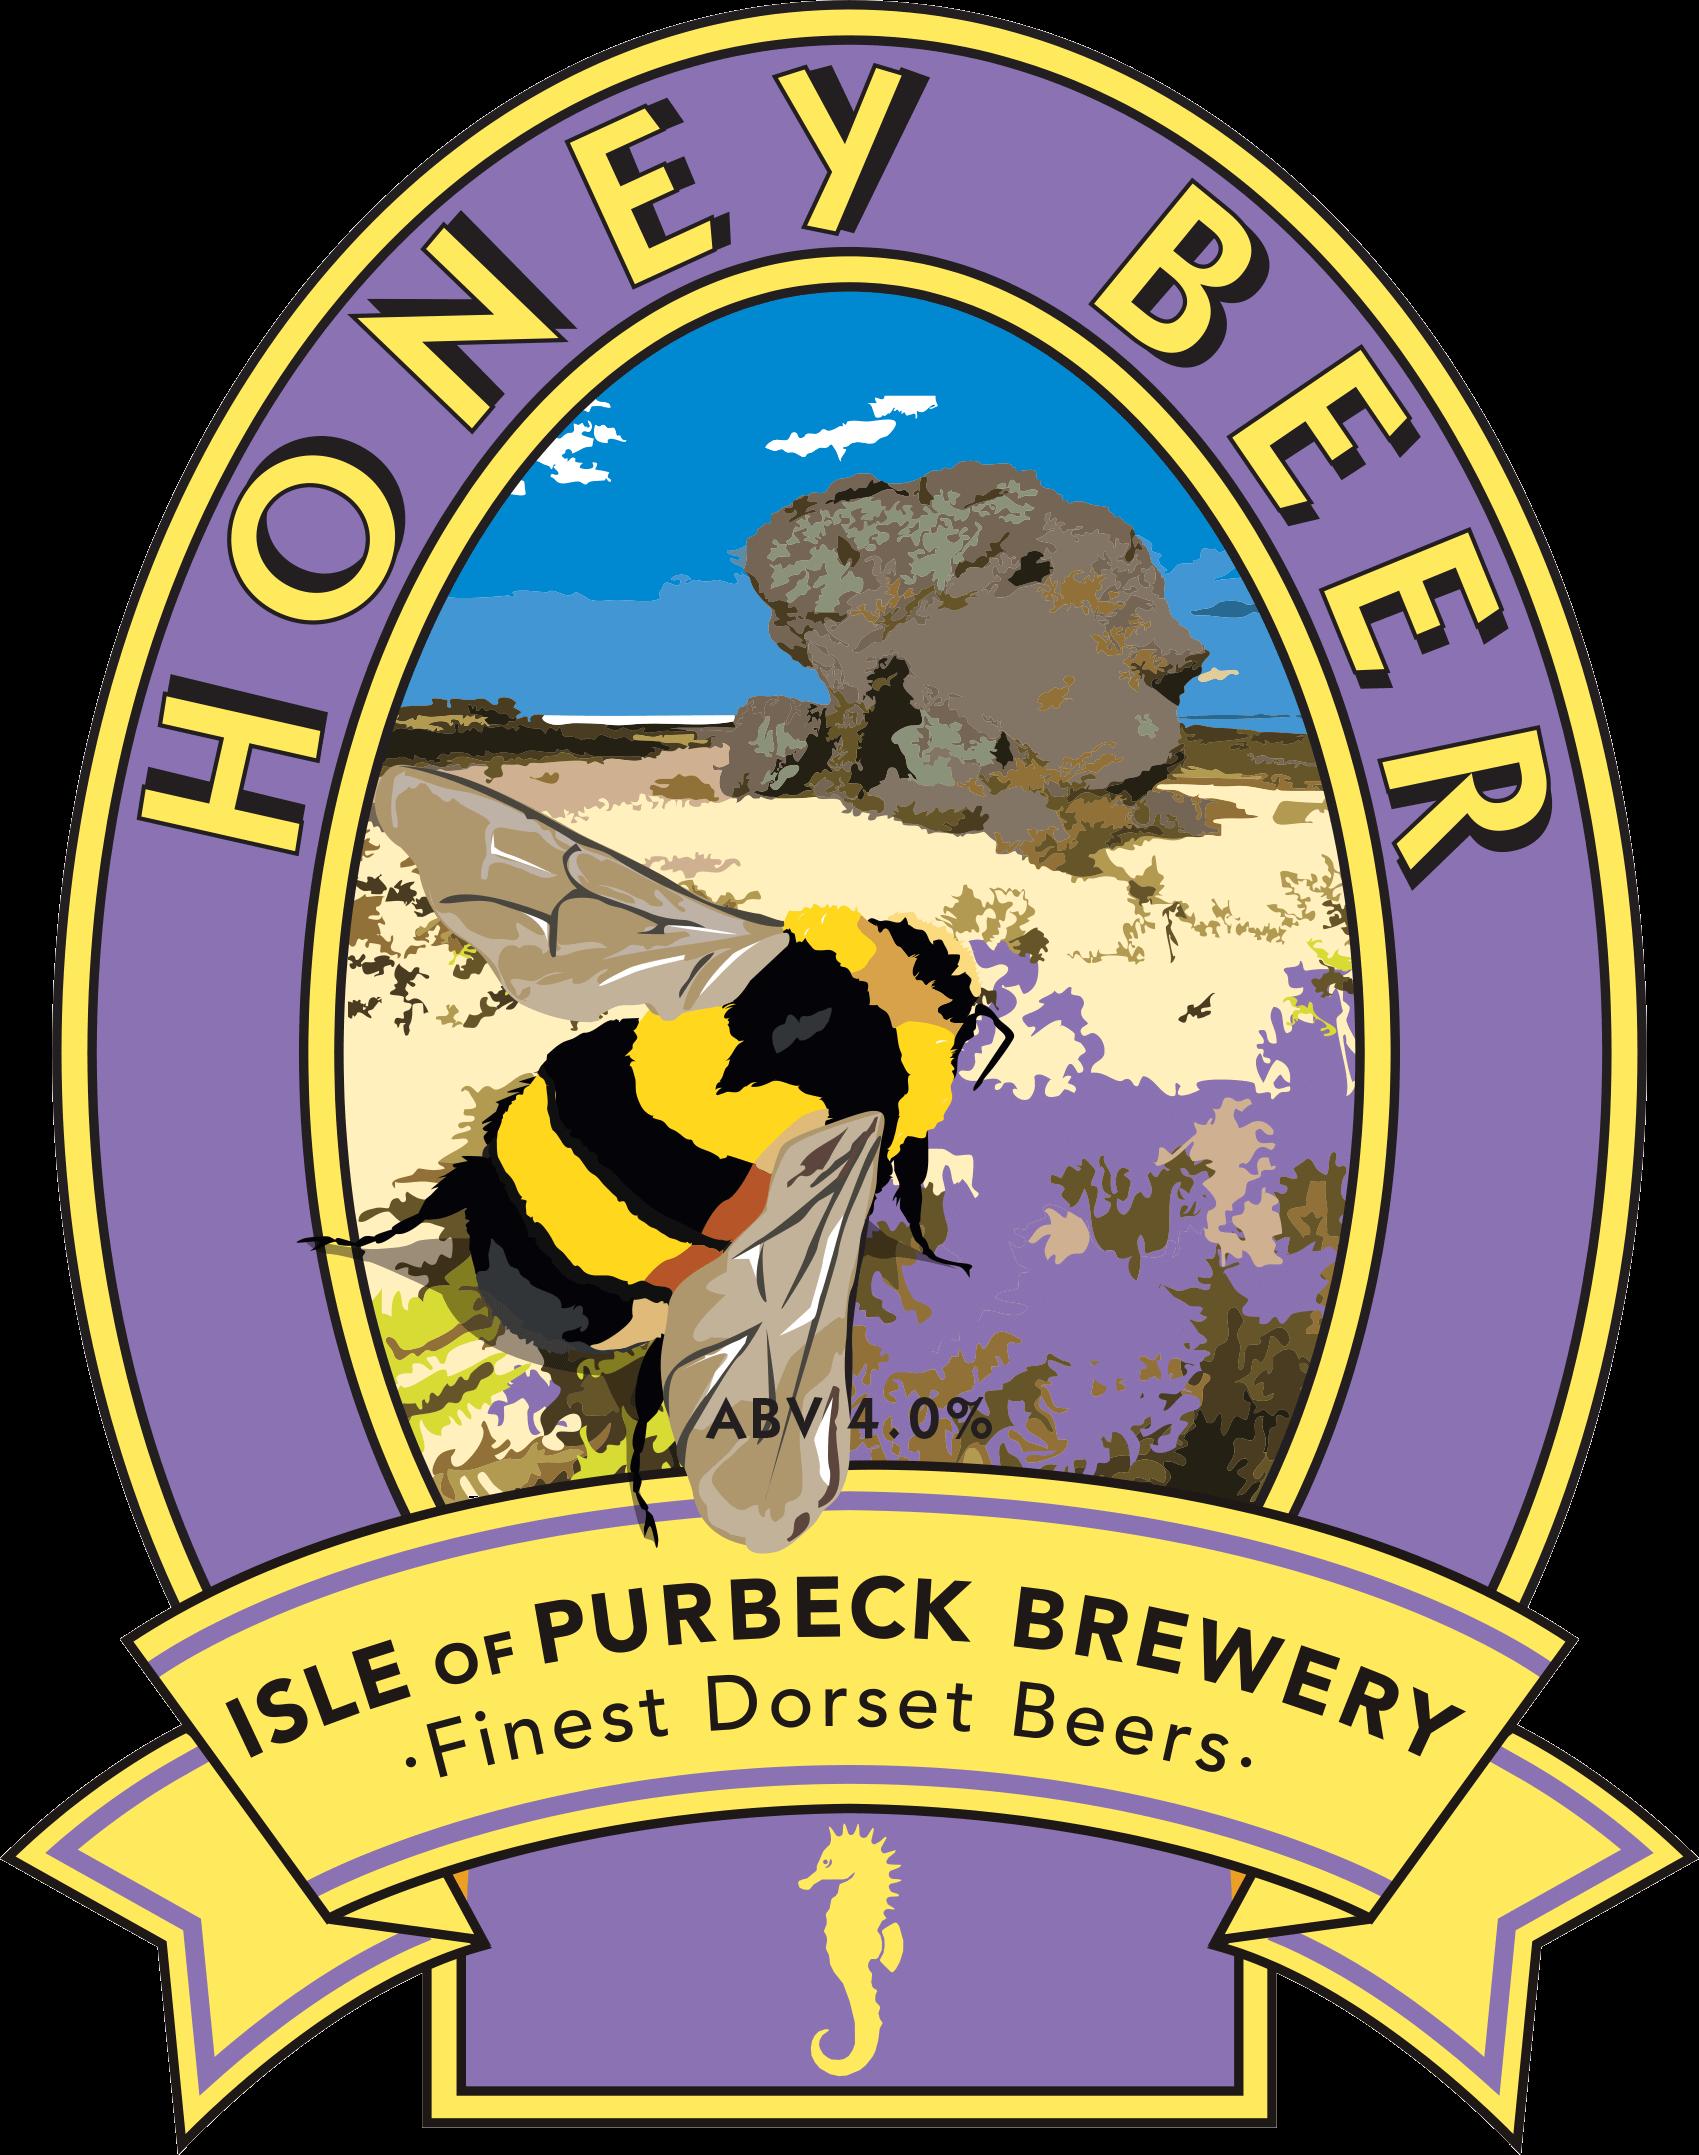 Isle of Purbeck Brewery Honey Beer pumpclip PNG